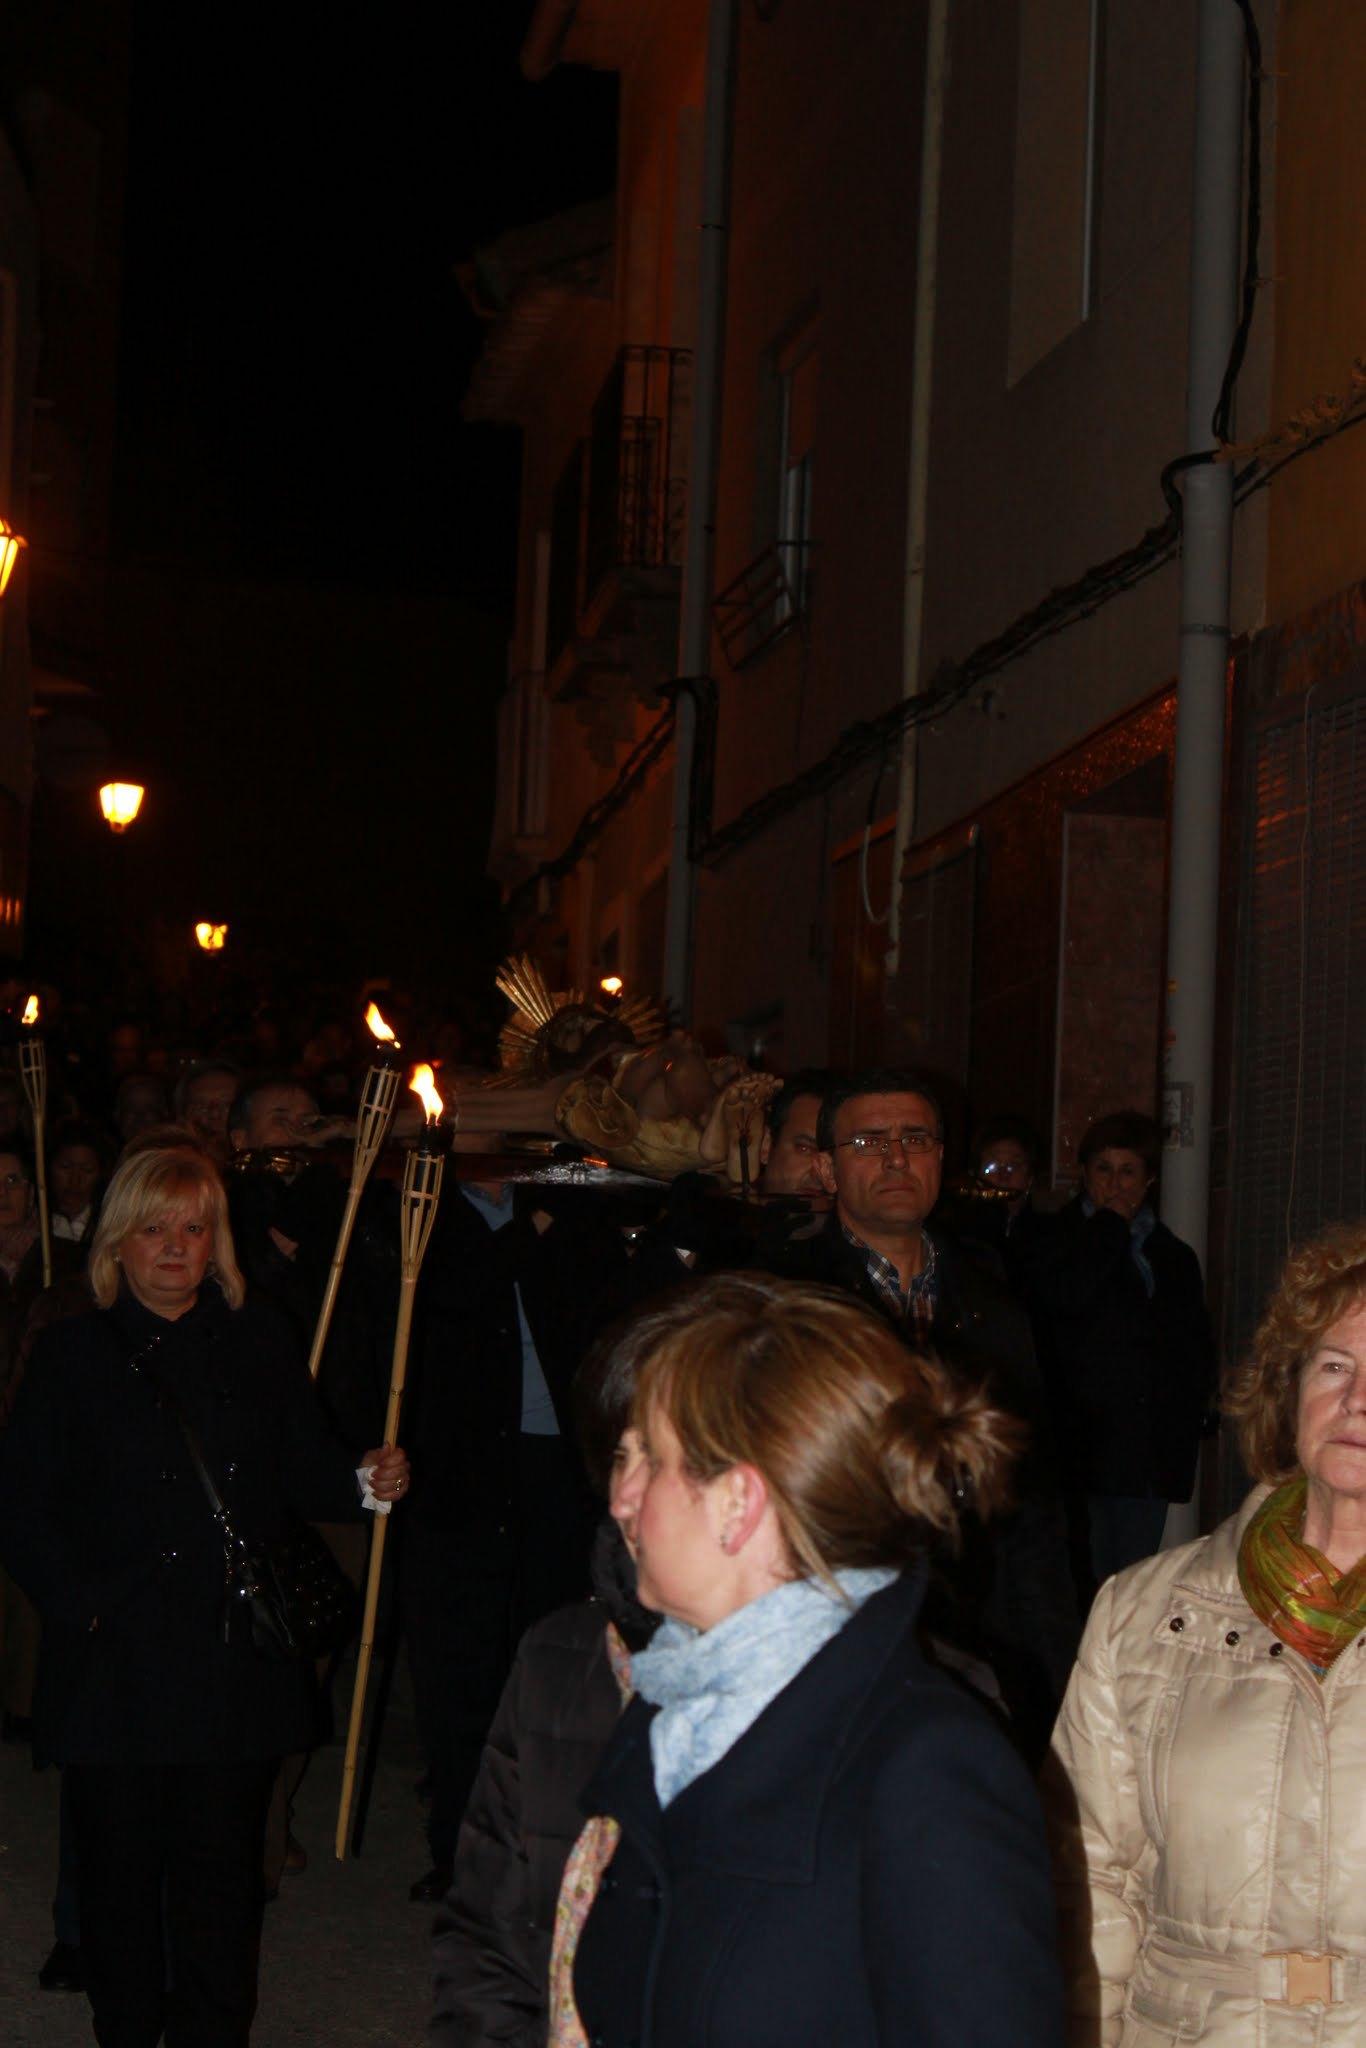 (2013-03-22) - IV Vía Crucis nocturno - Javier Romero Ripoll (58)